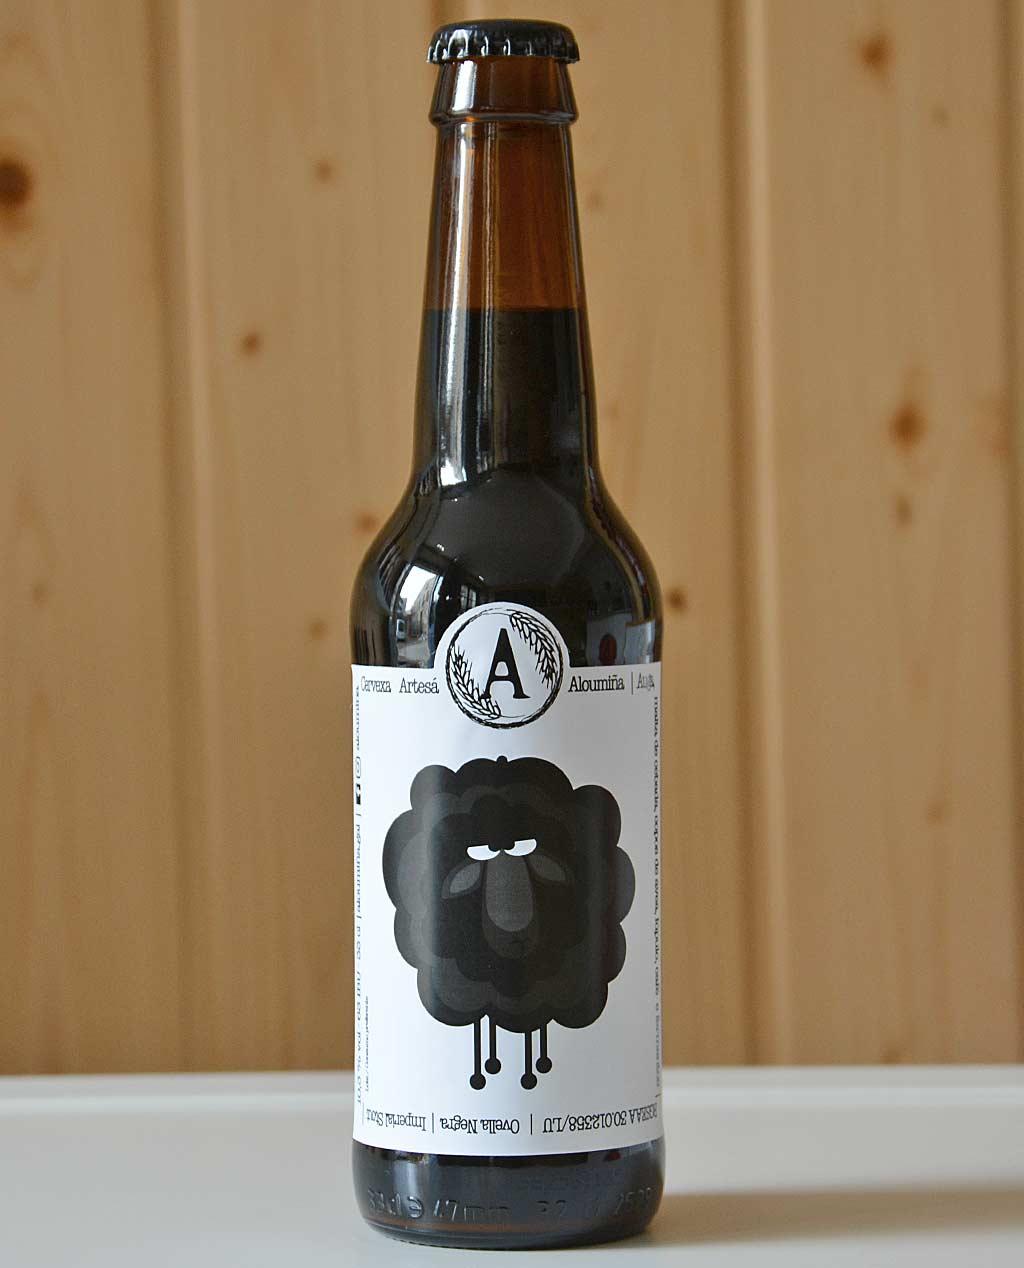 aloumina-cerveza-artesana-craft-beer-lugo-galicia-ovellanegra-russianimperial-1024